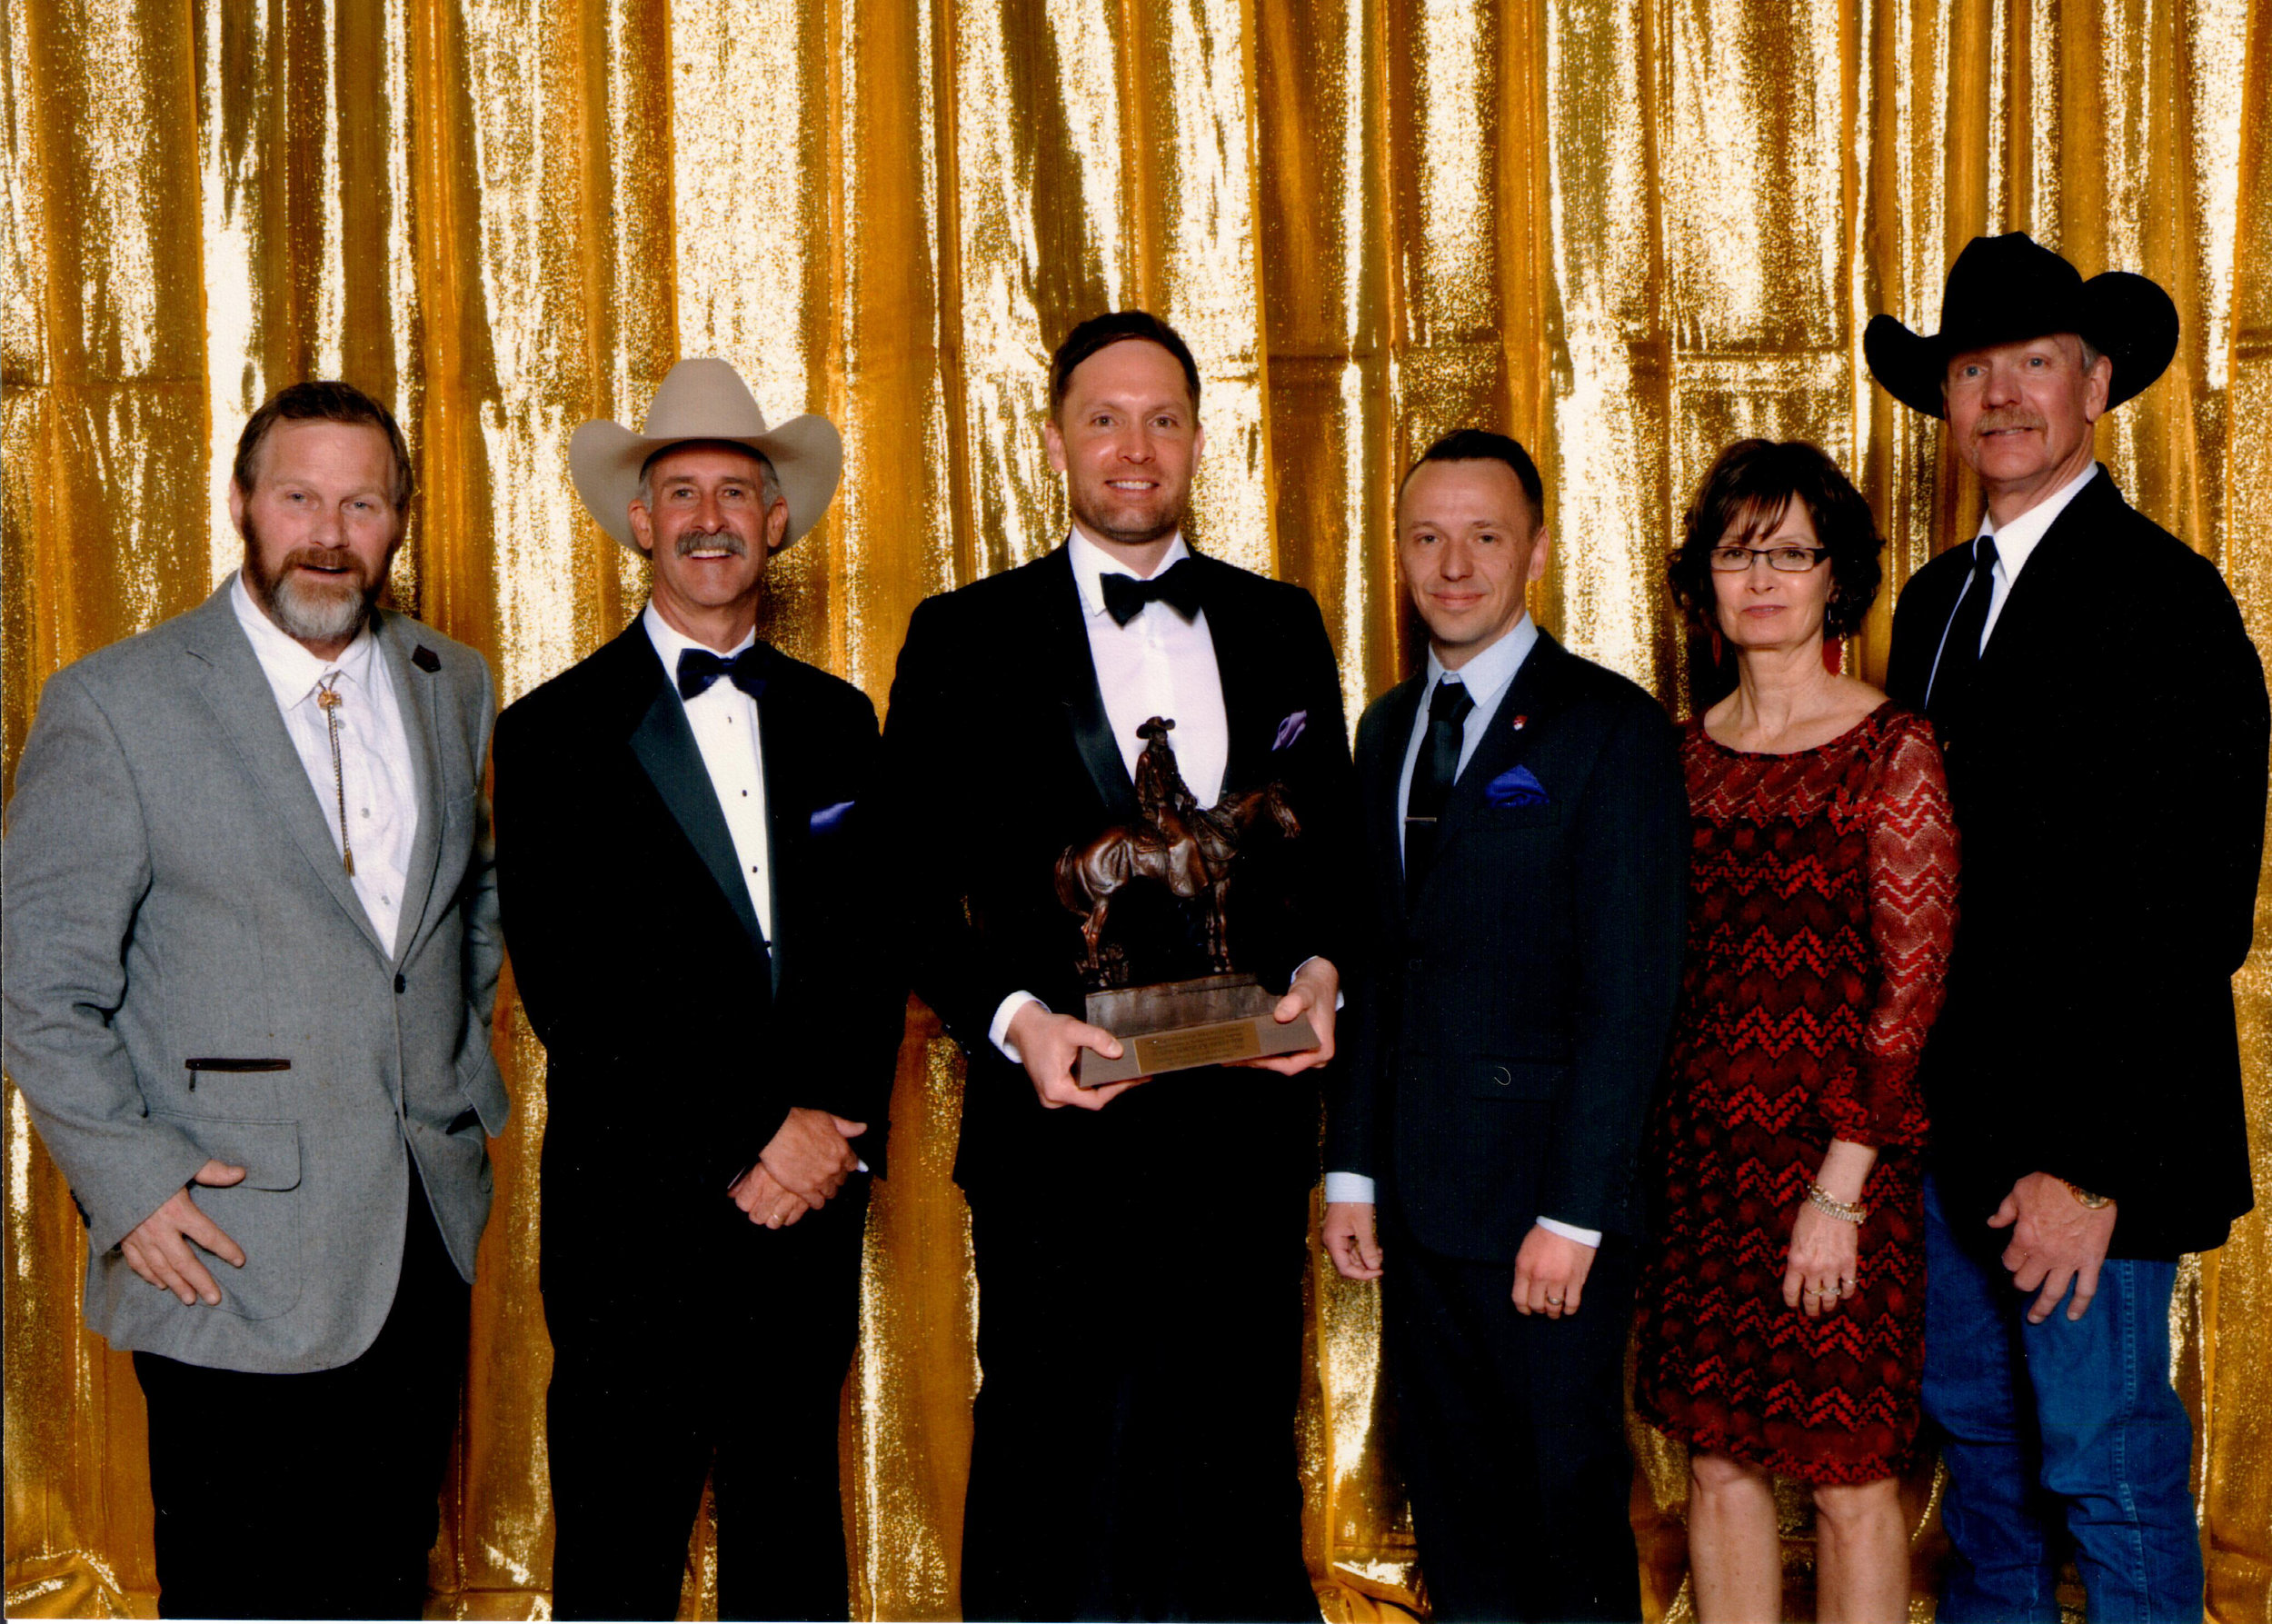 "From left: Daniel ""Boone"" Johnson, Wyatt McCrea, Justin Koehler, Aaron Pendergast, Cindy Koehler, Mike Koehler"